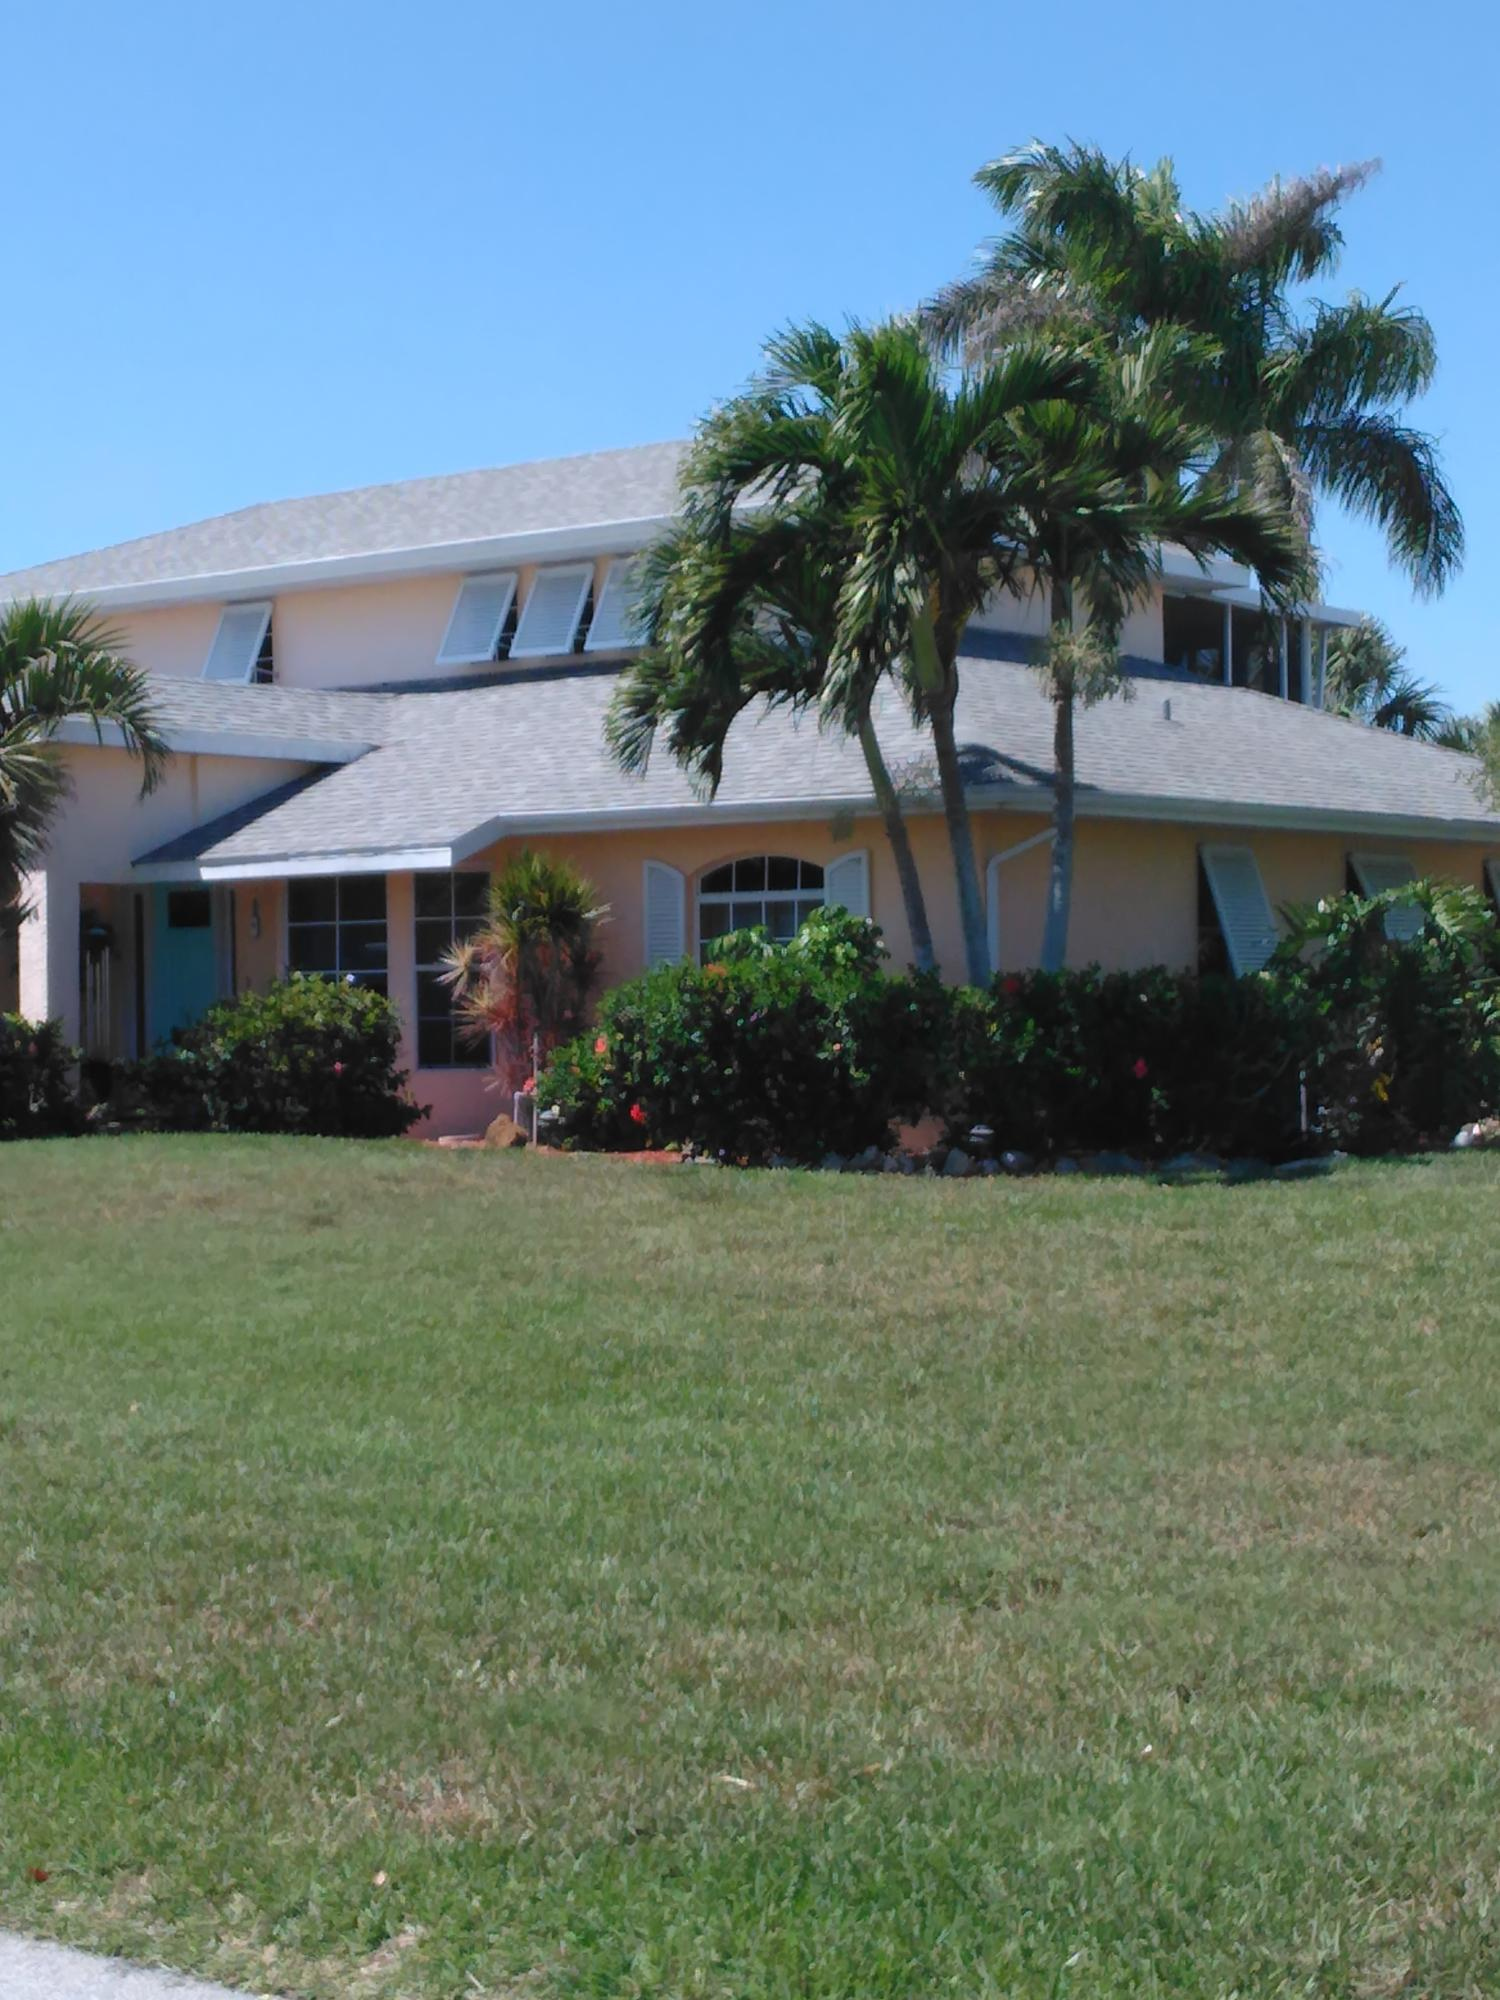 14 Sovereign Hutchinson Island 34949